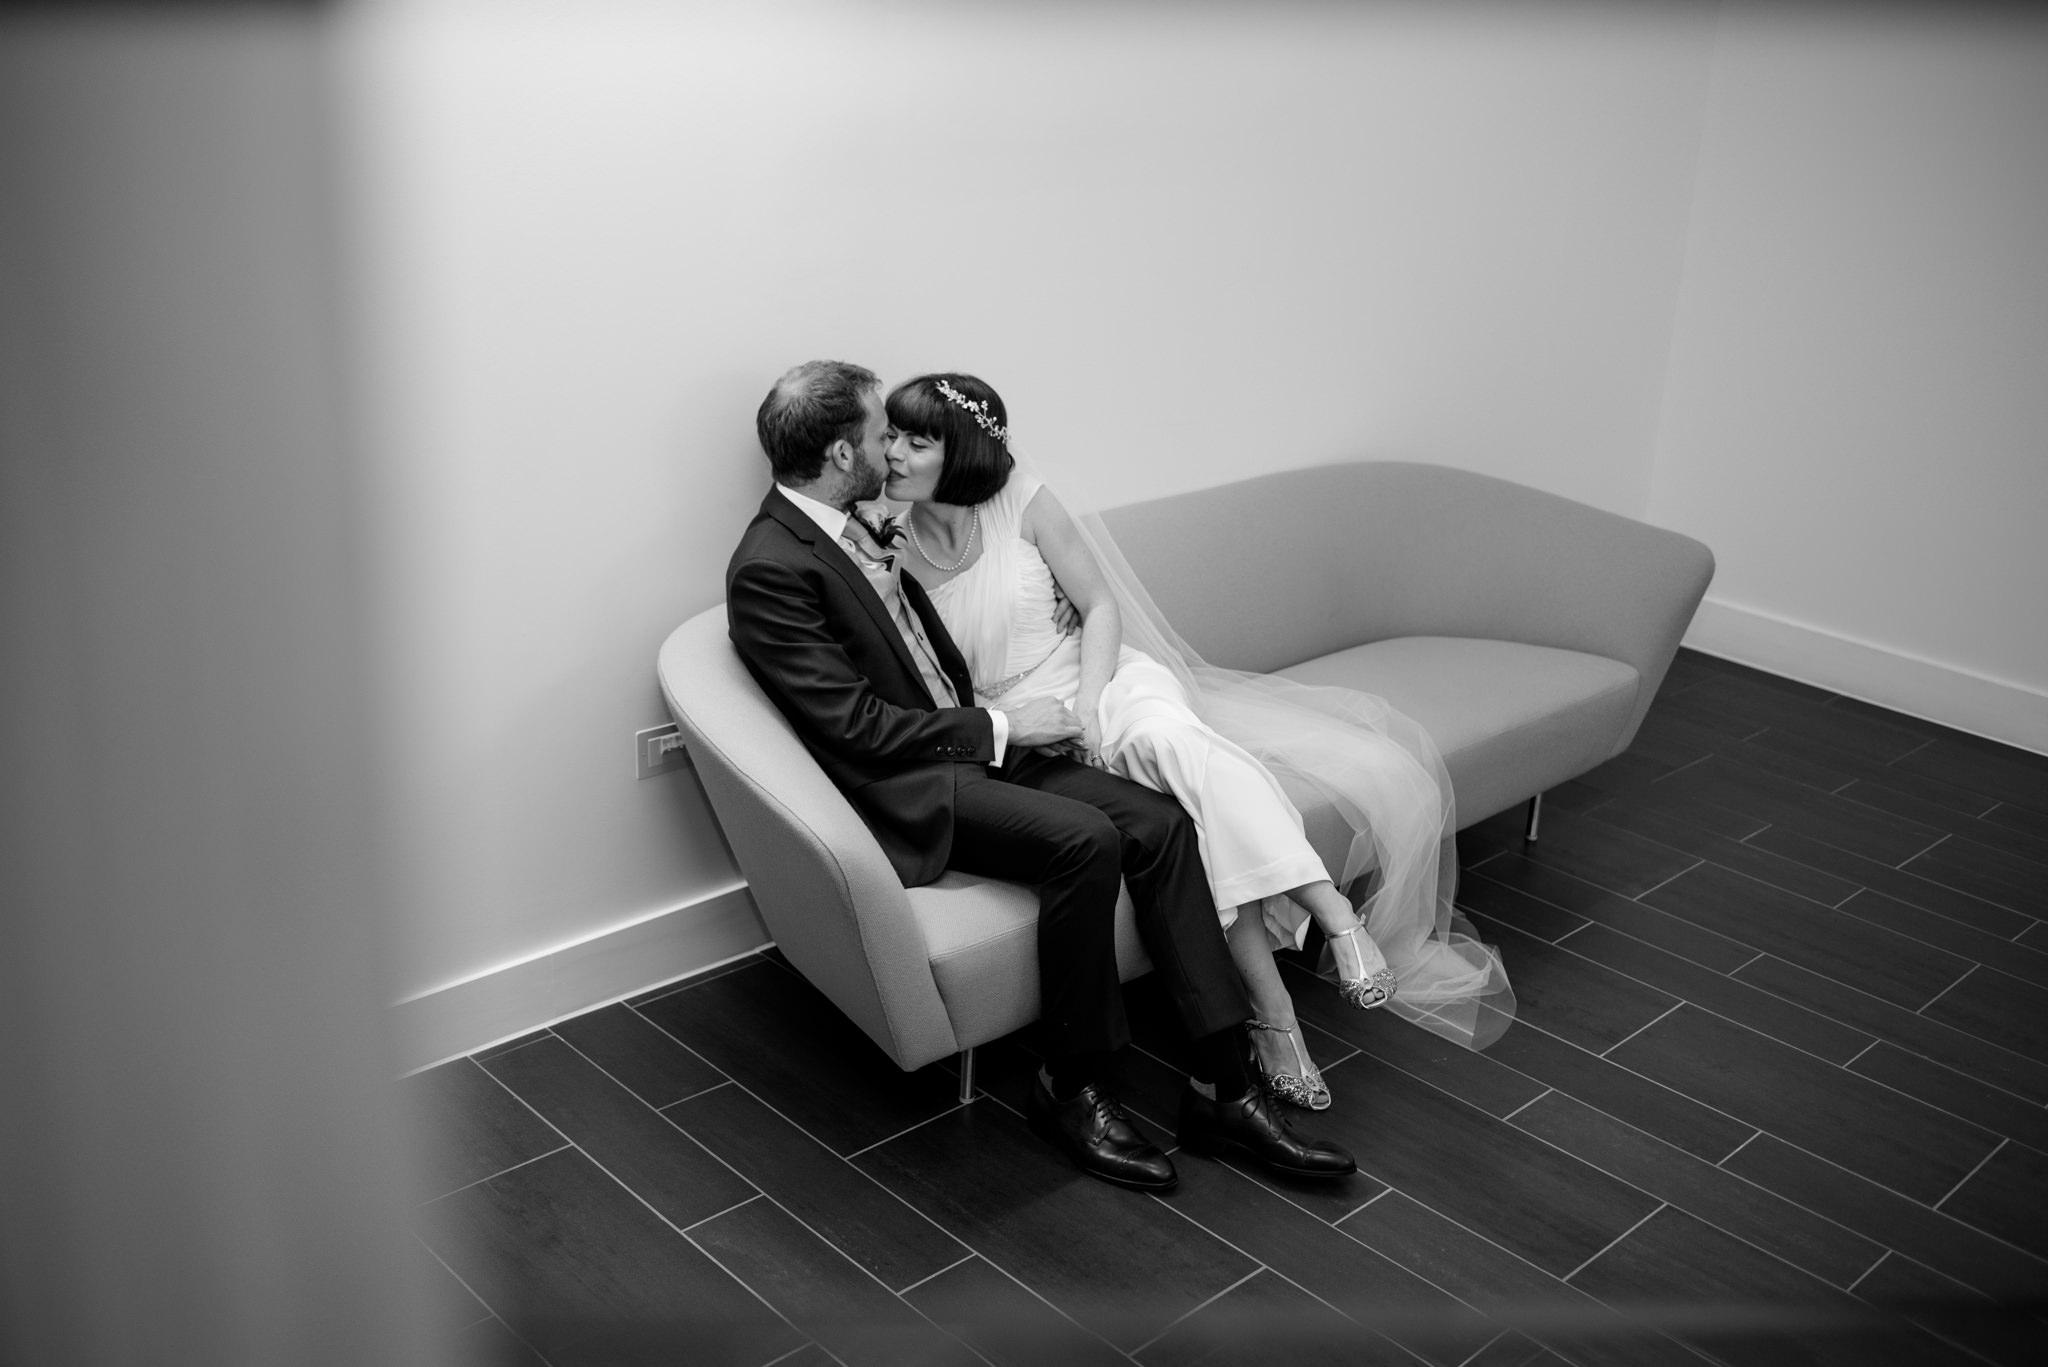 Susan and Adam - wedding preview - © Julie Broadfoot // Juliebee // www.juliebee.co.uk